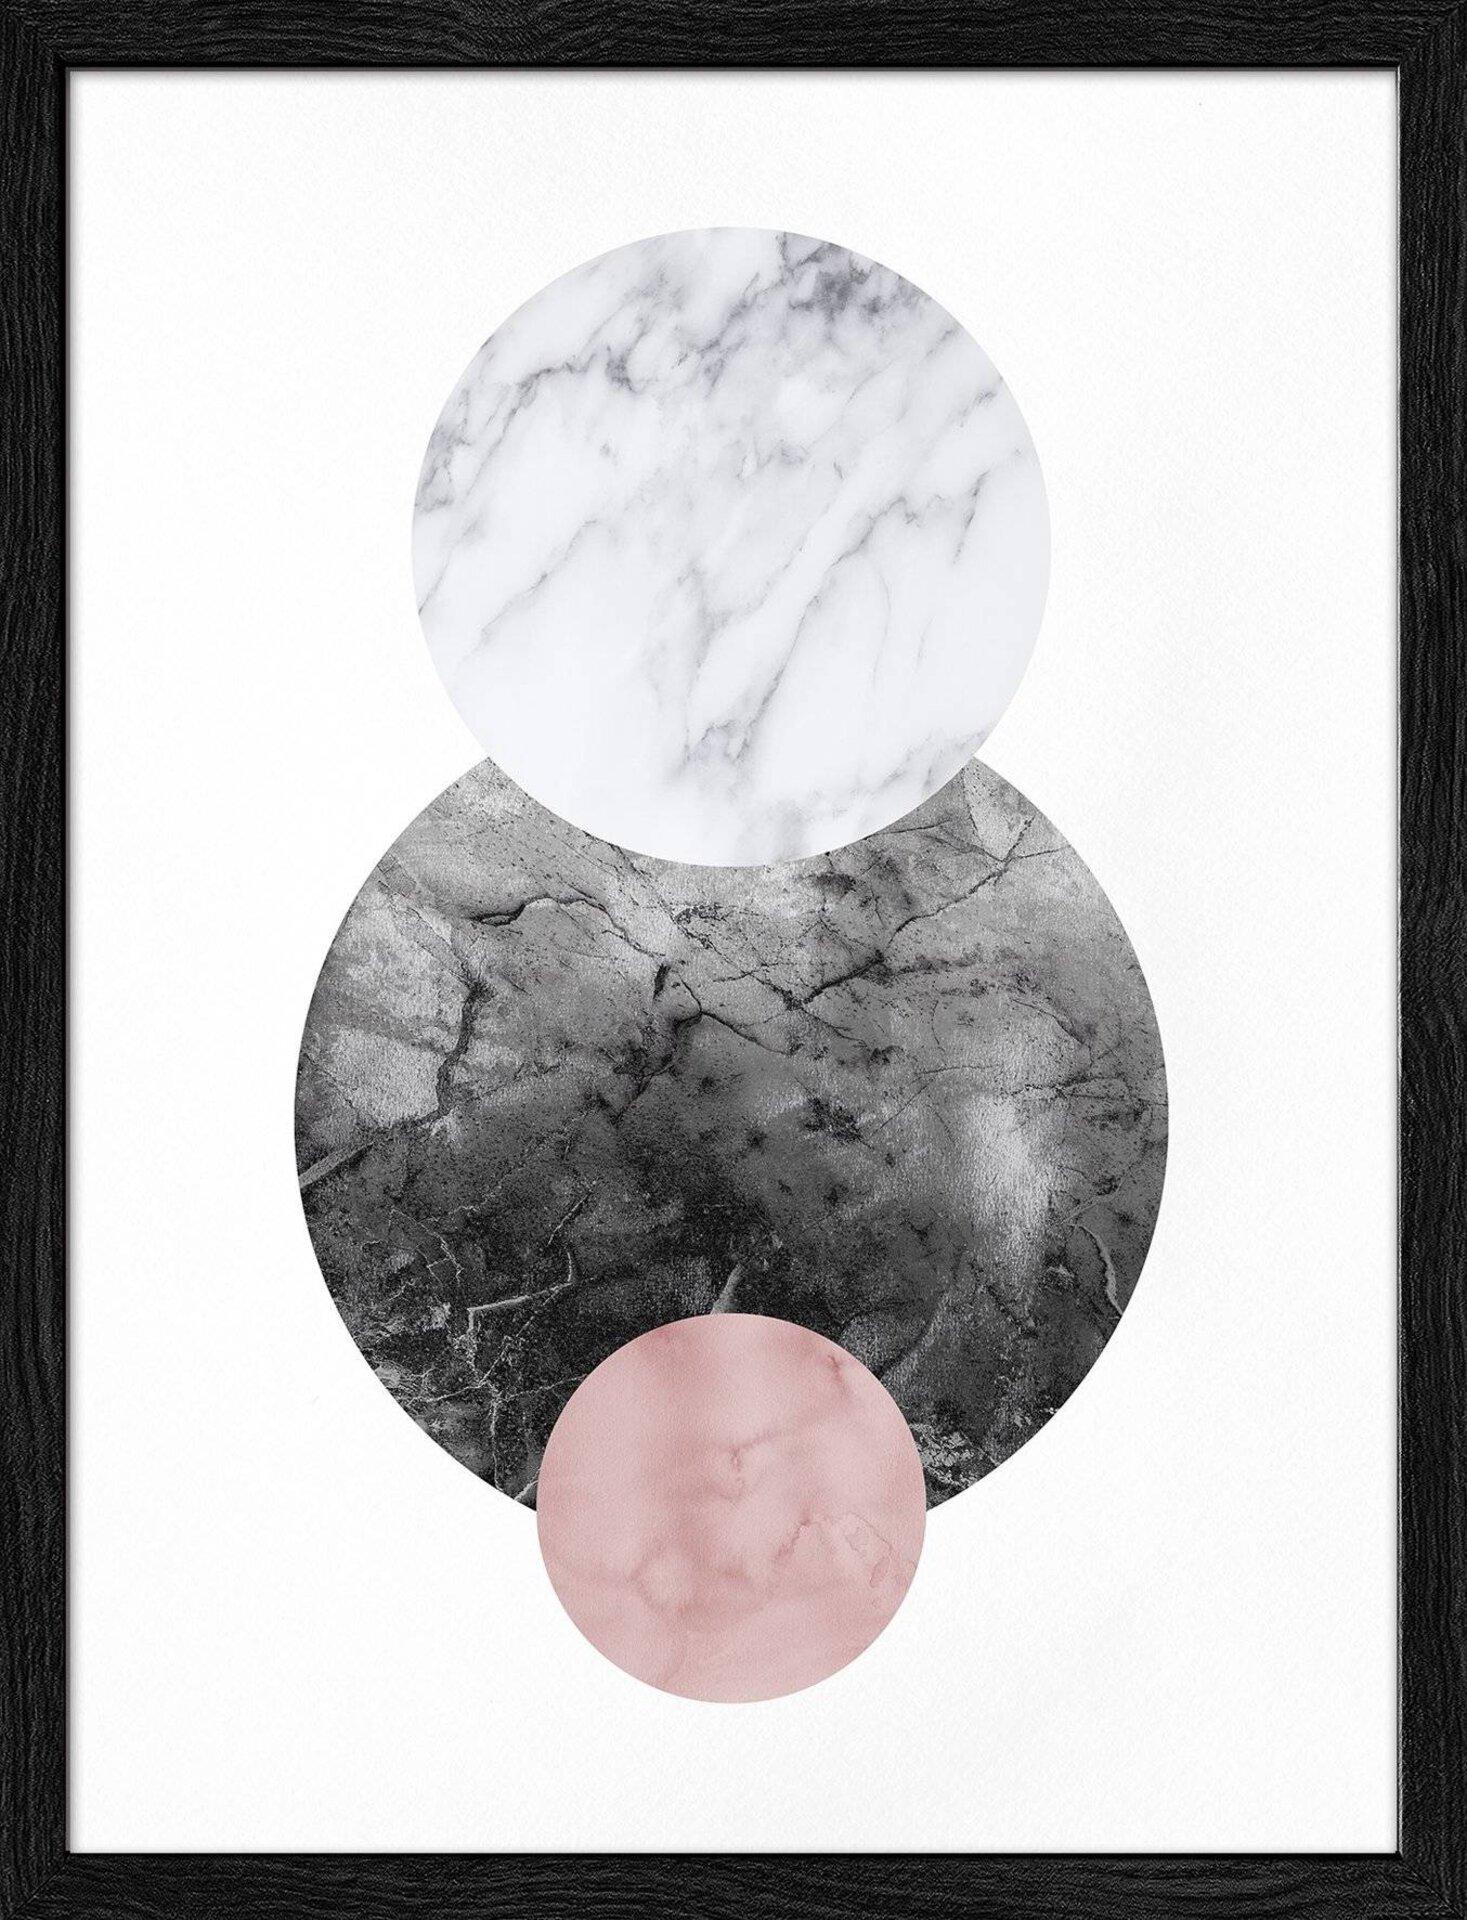 Bild Geometrical Forms II Pro-Art Papier mehrfarbig 42 x 32 x